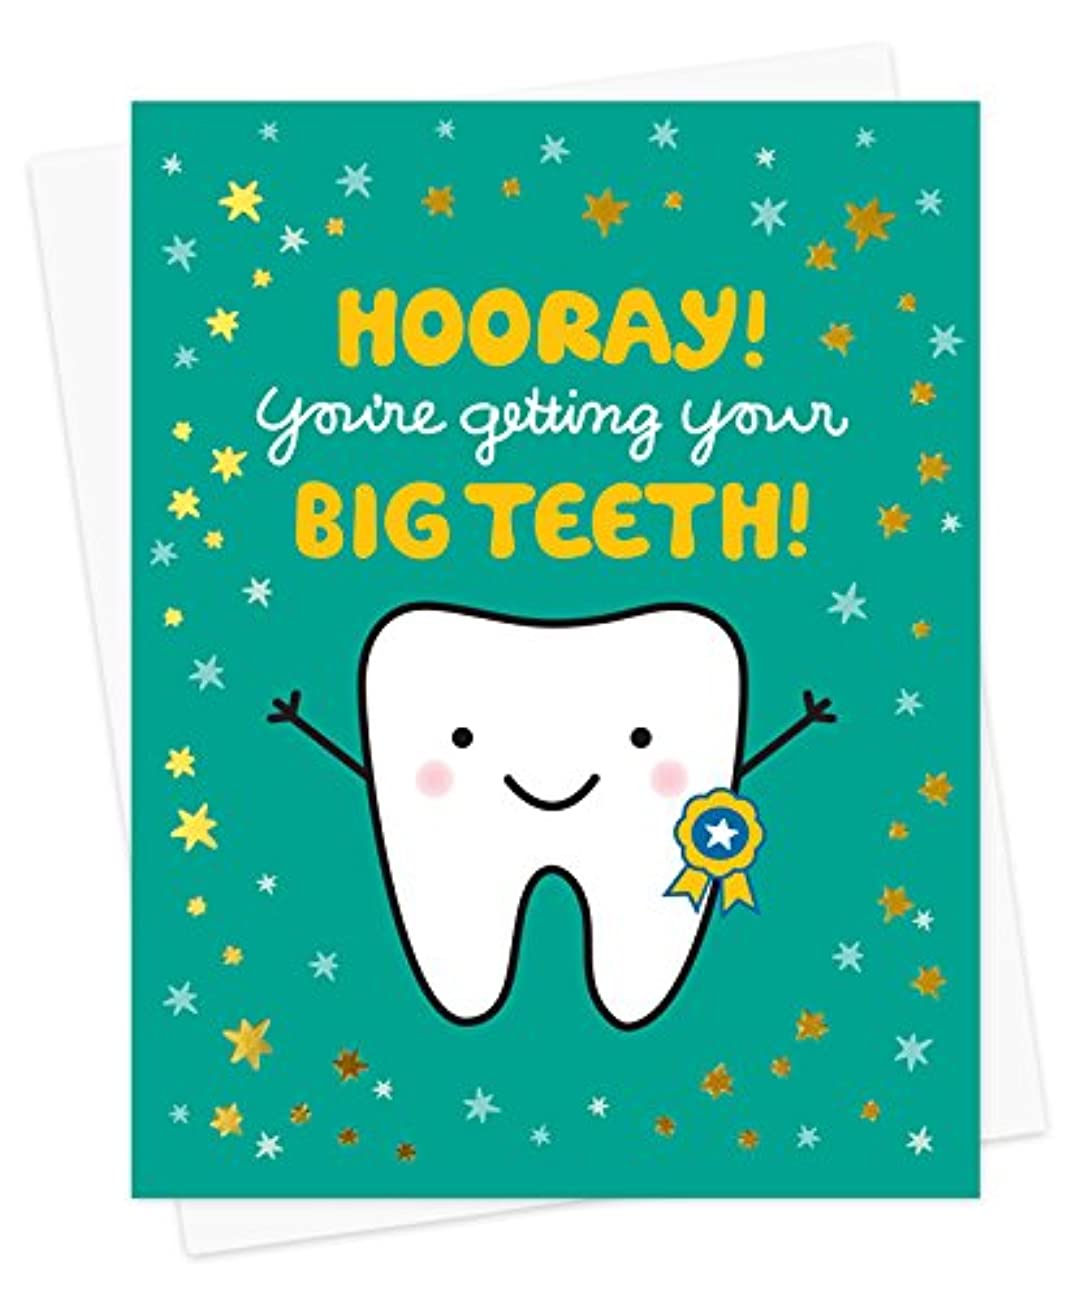 Night Owl Paper Goods Big Teeth Gold Foil Embellished Congratulations Card